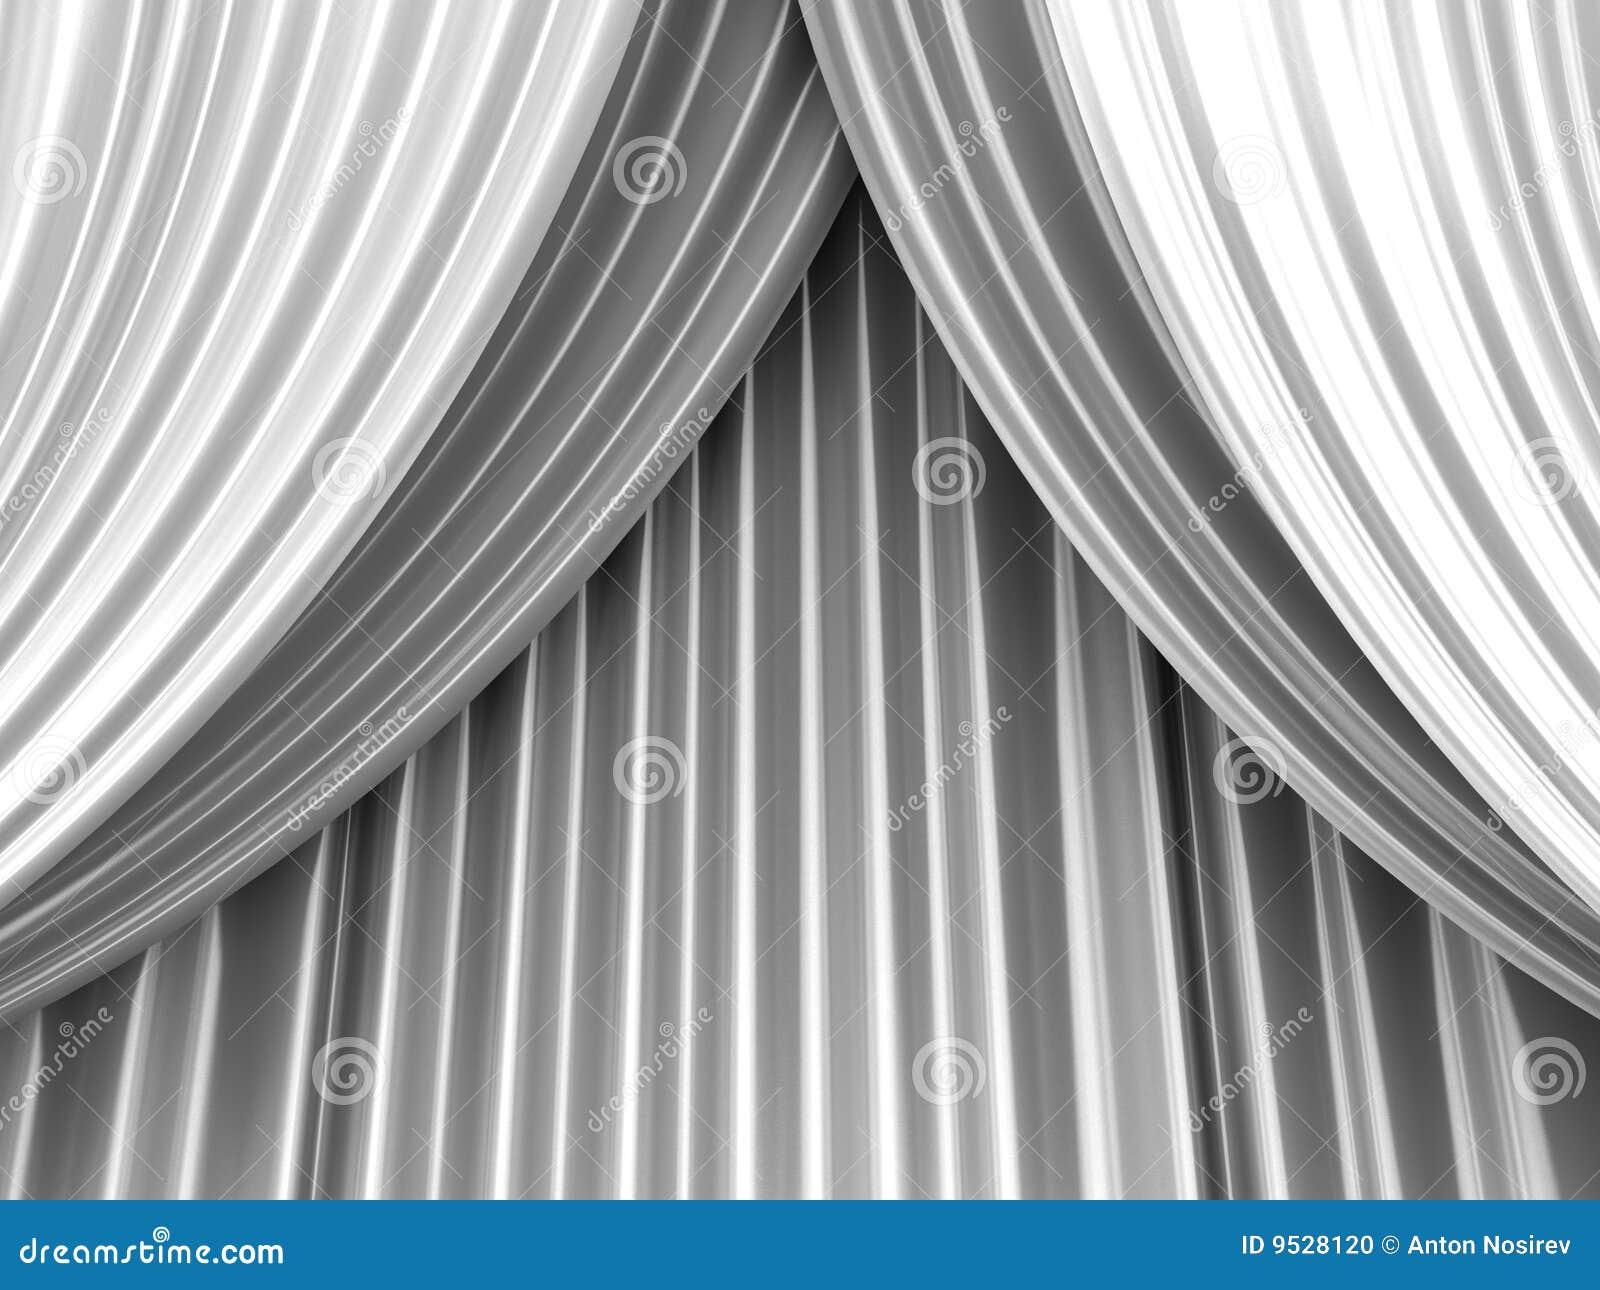 White Theater Curtain Stock Photo Image 9528120